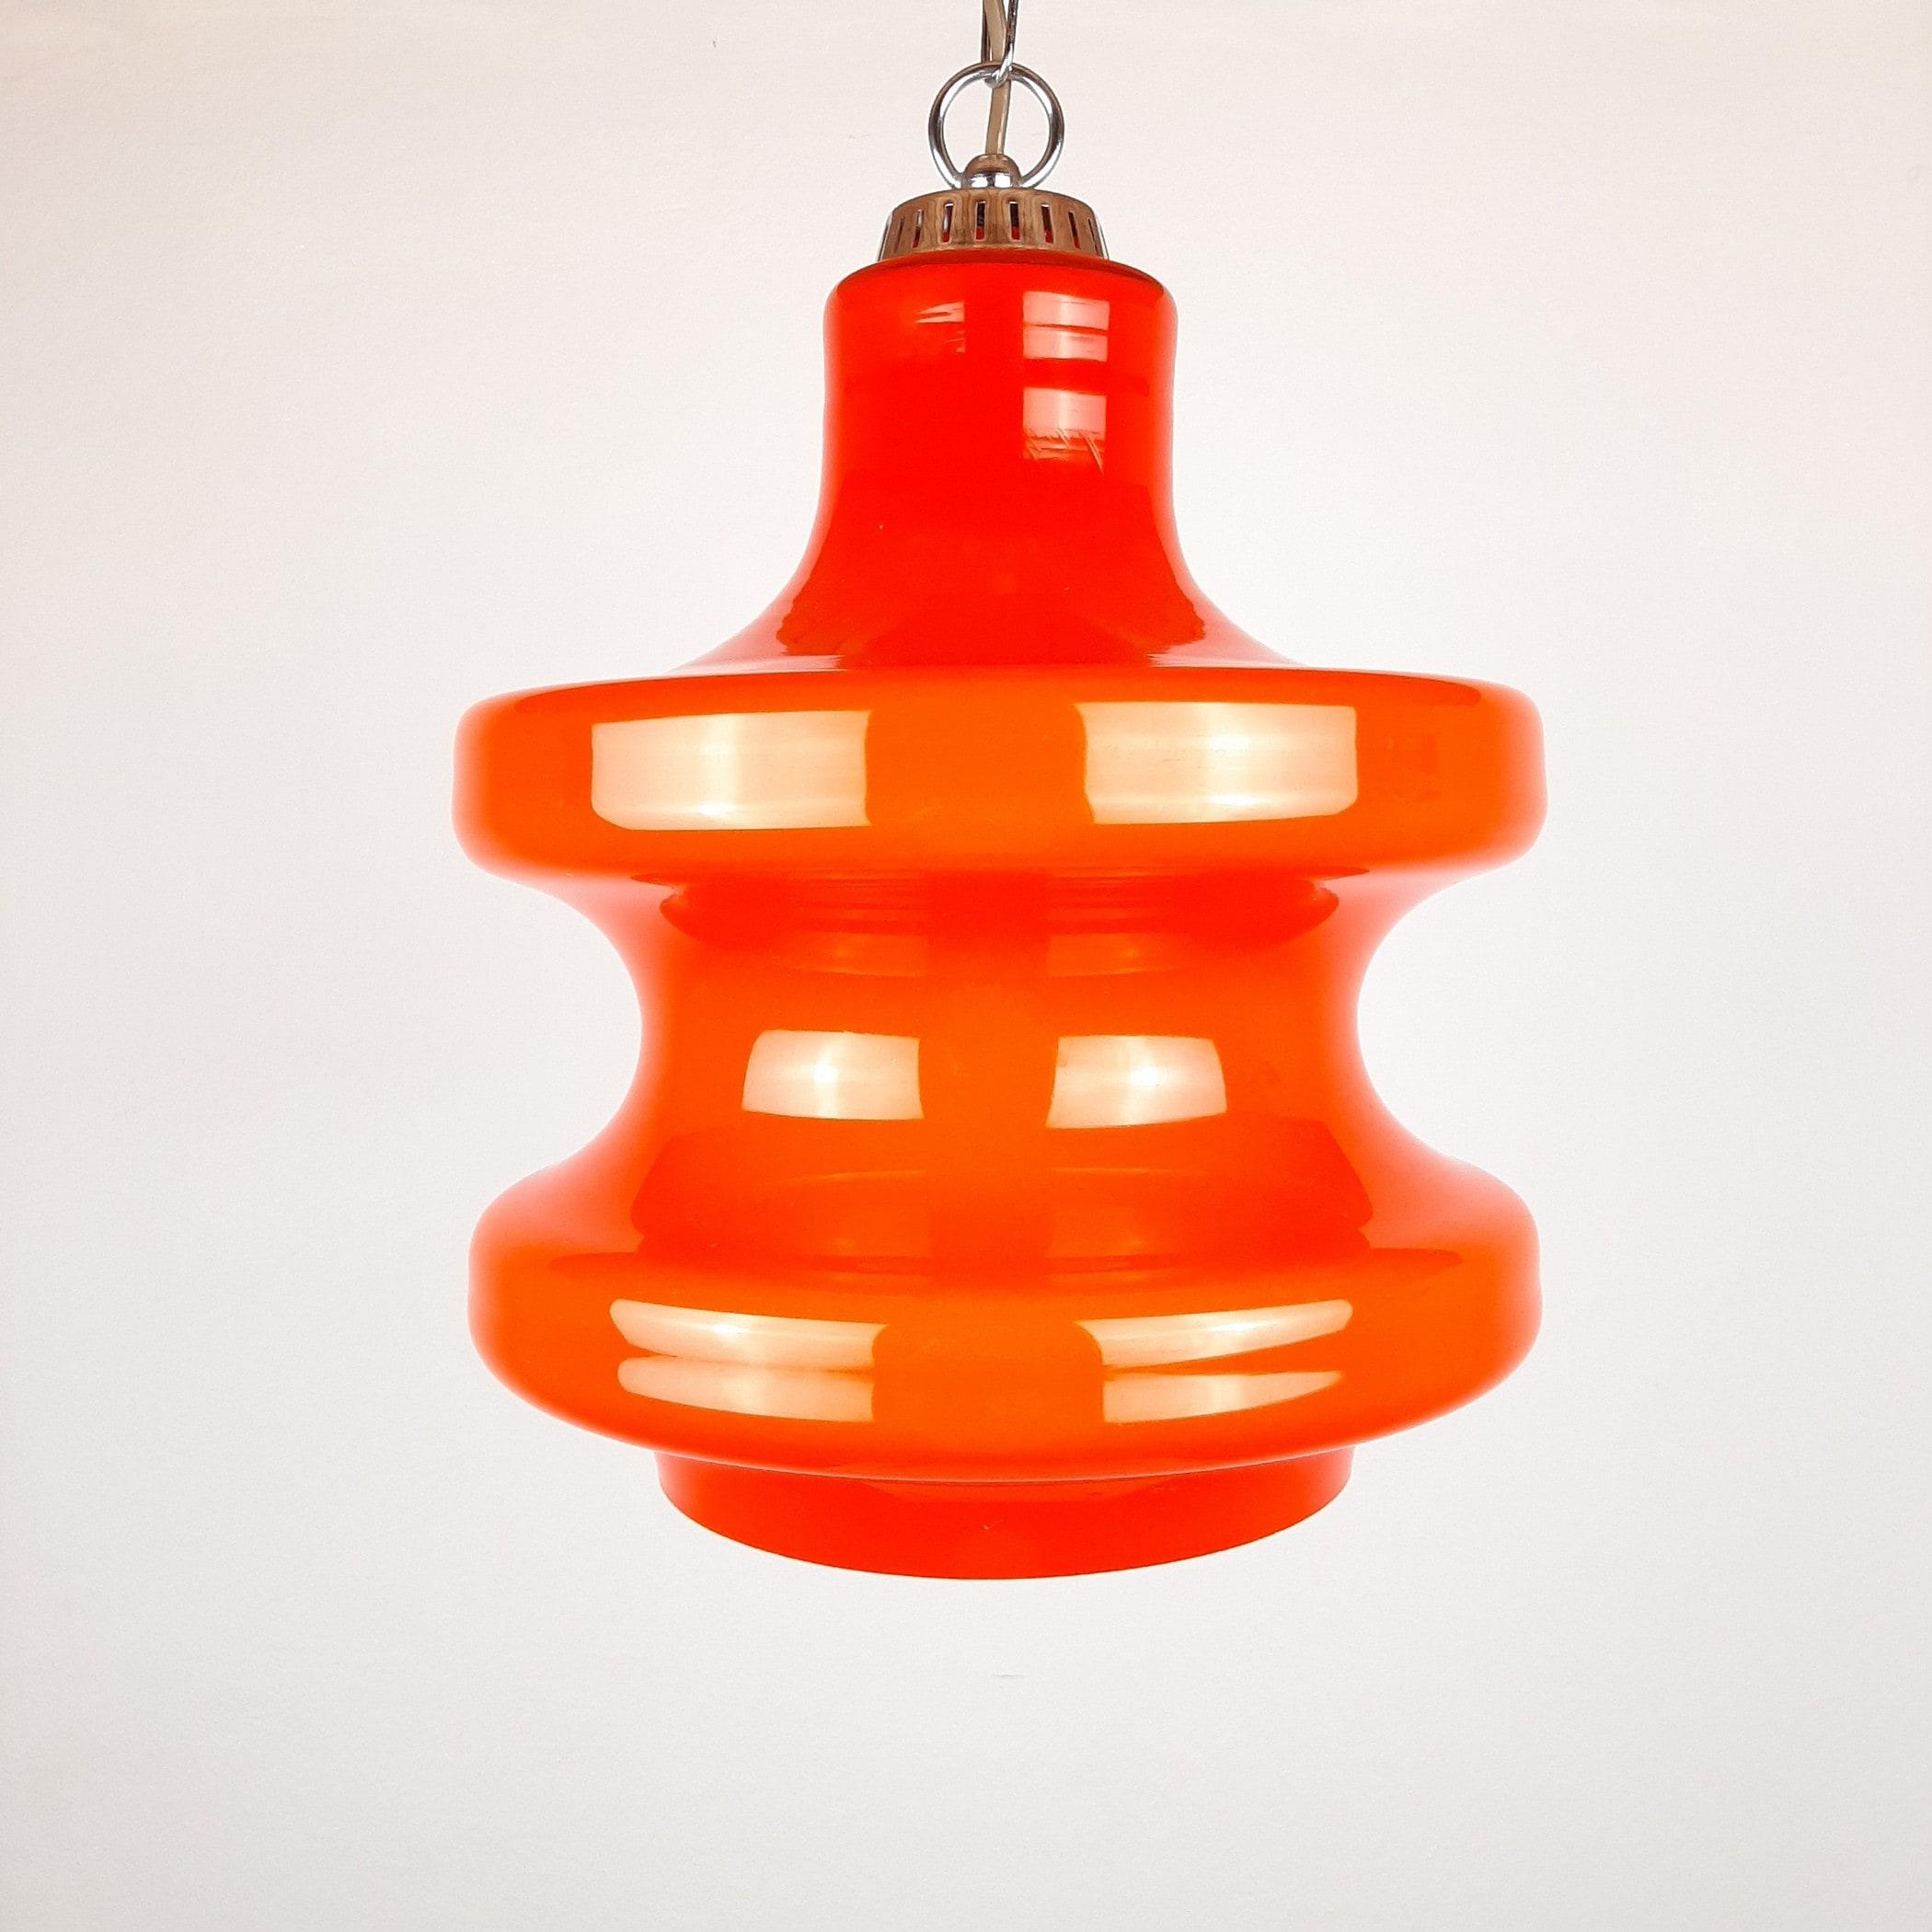 Mid-century pendant lamp Emi Poljcane Orange glass Yugoslavia 70s Retro lighting Space age Atomic